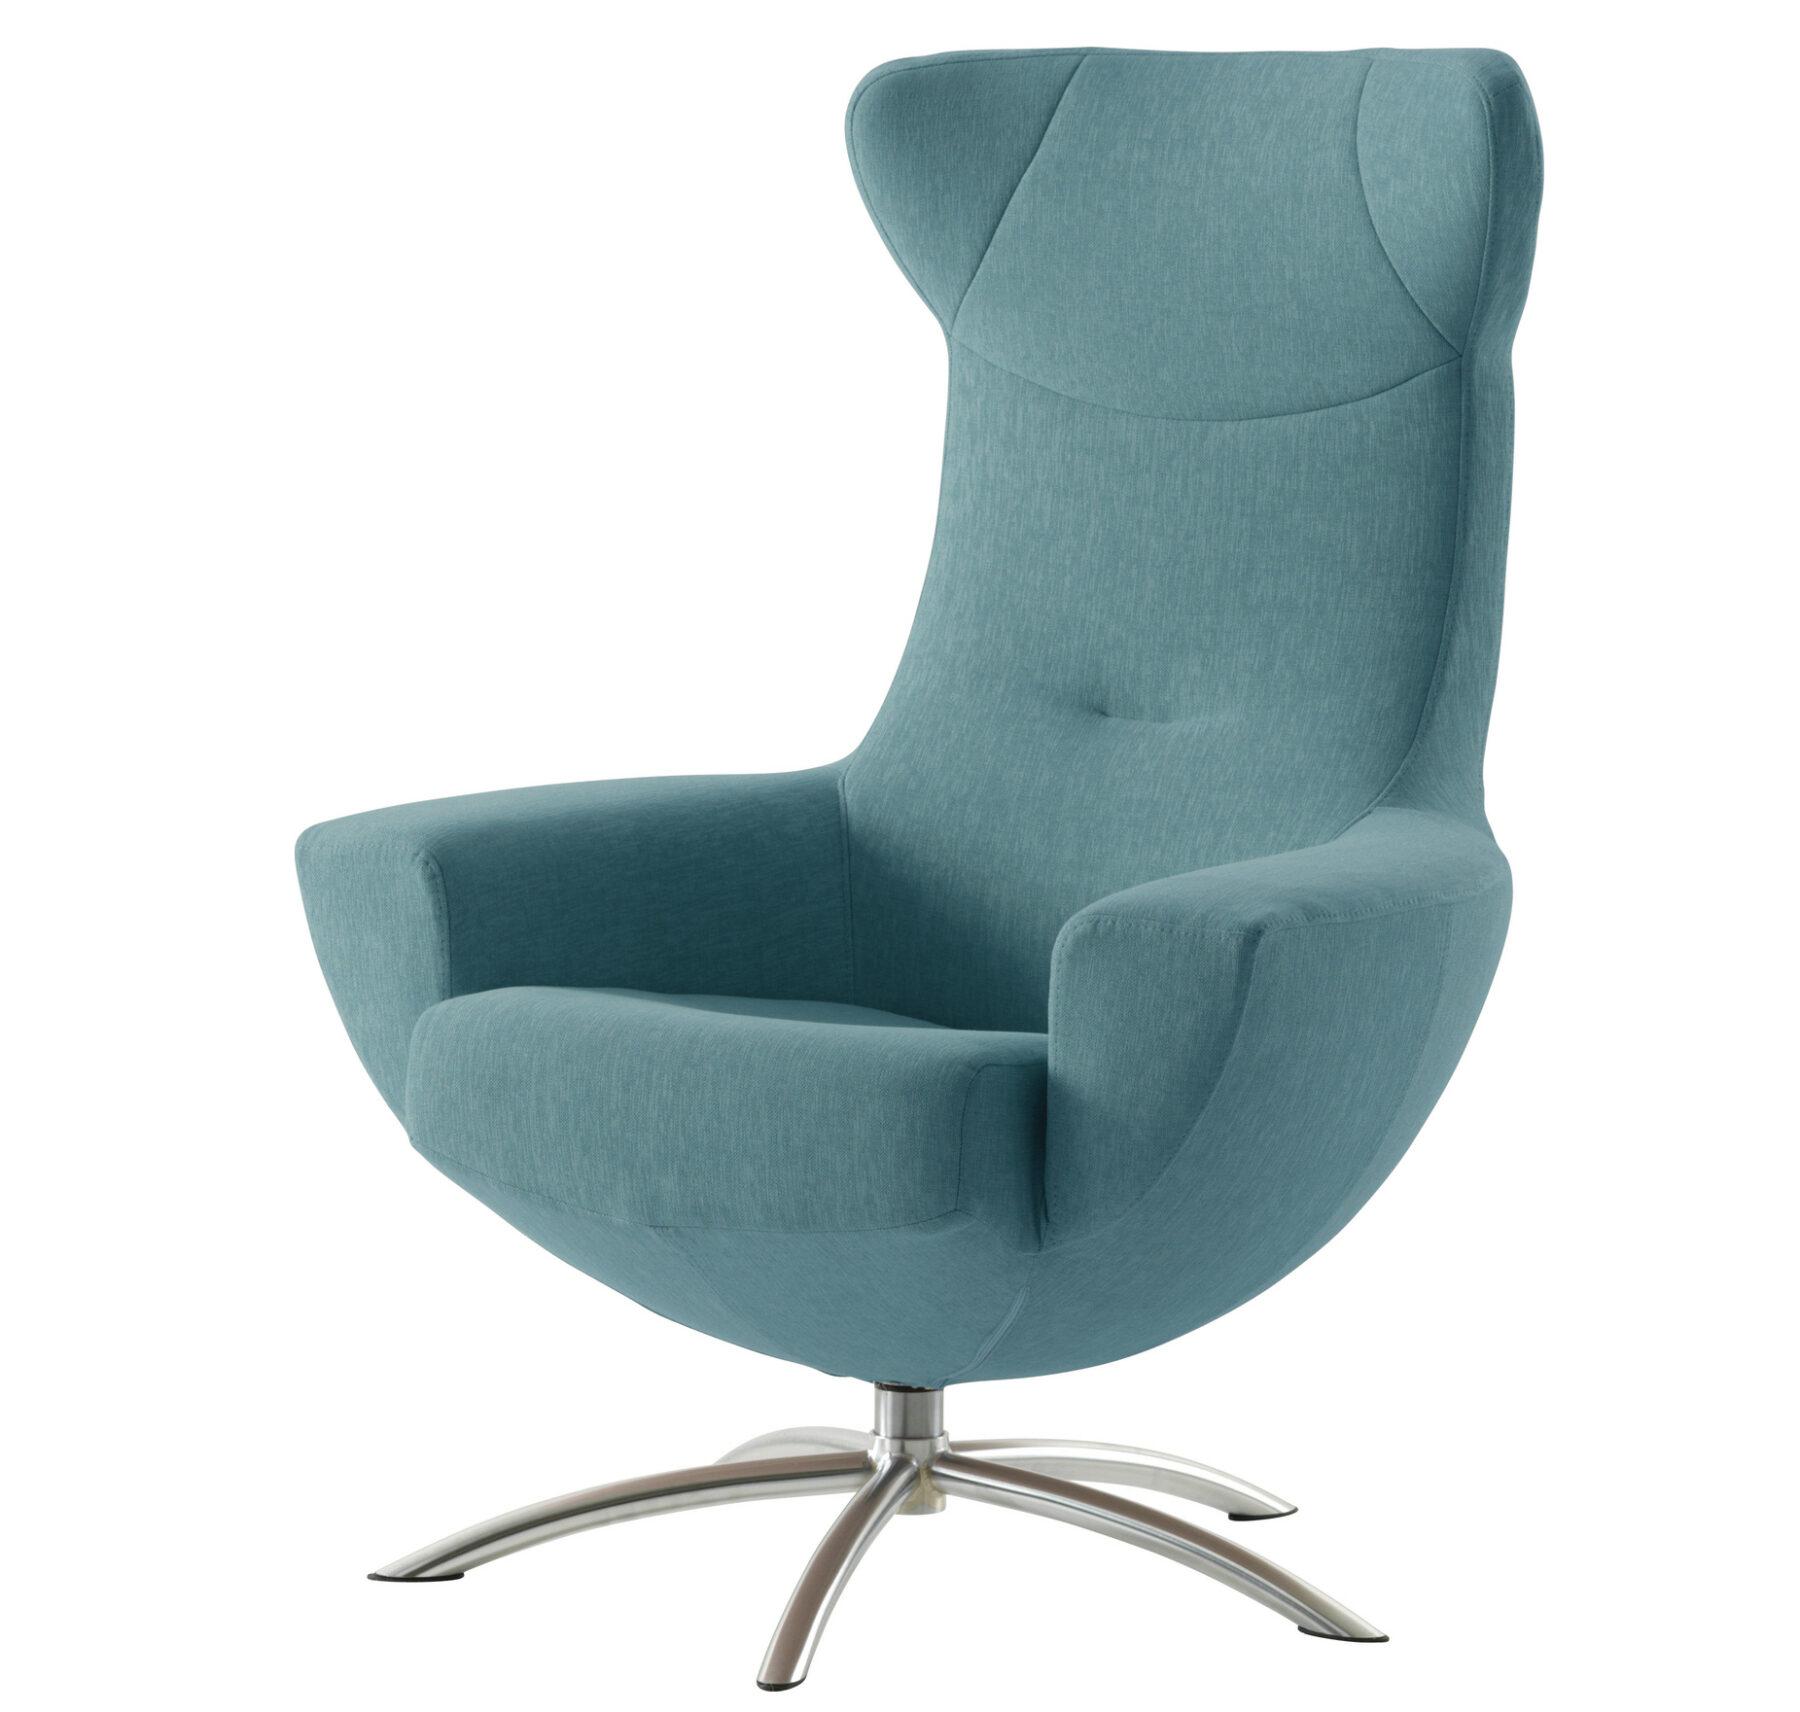 663006-21_Baloo chair_Bella Petrol 02_Børstet1